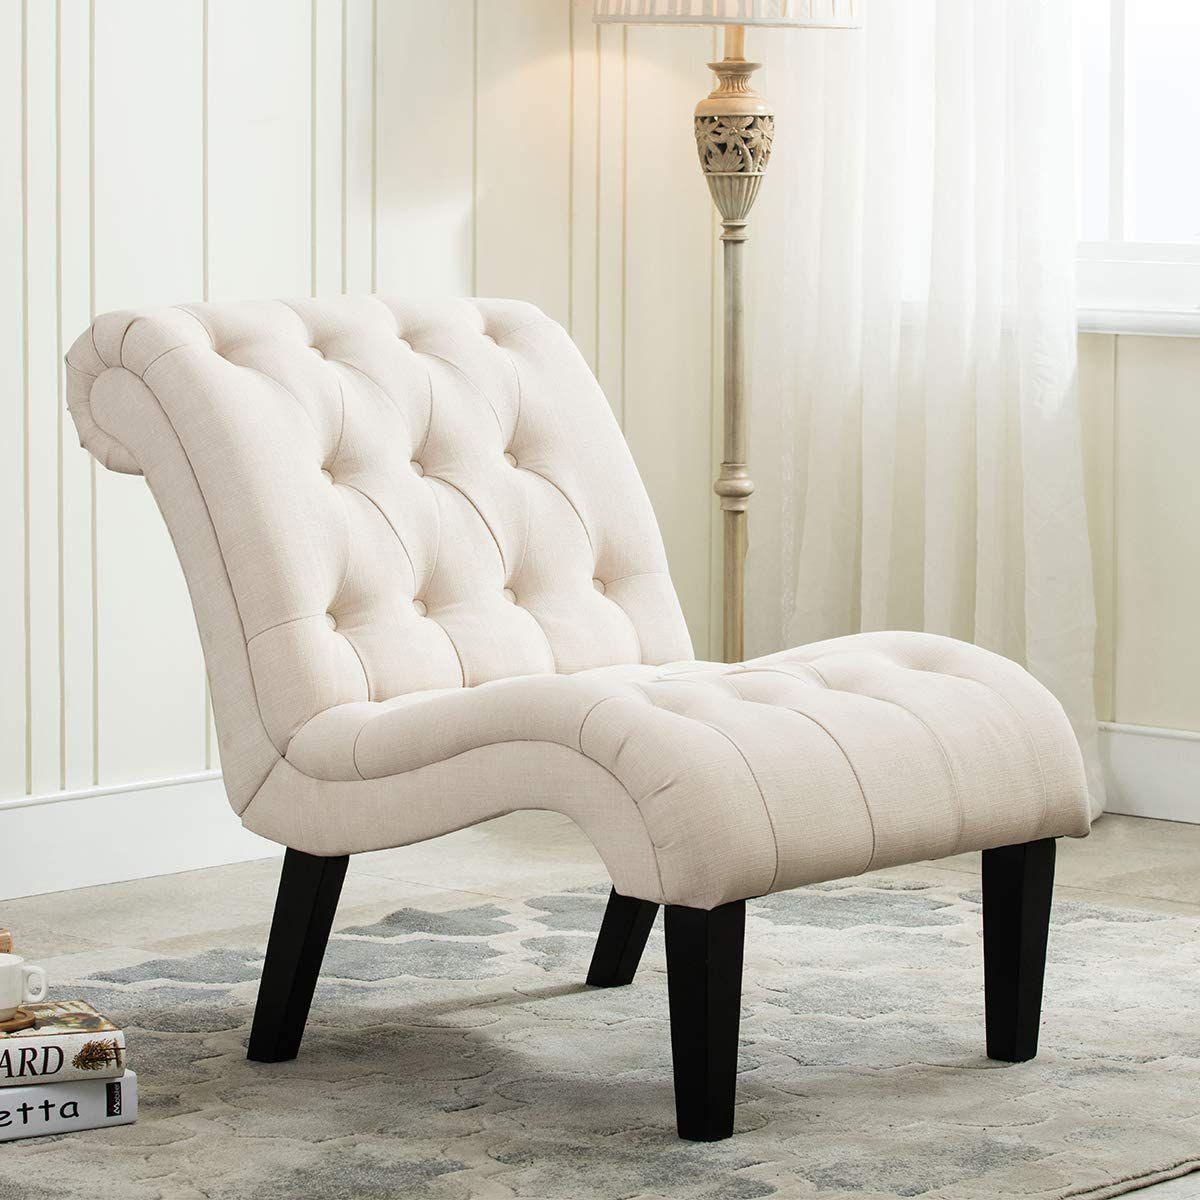 Yongqiang Upholstered Chair